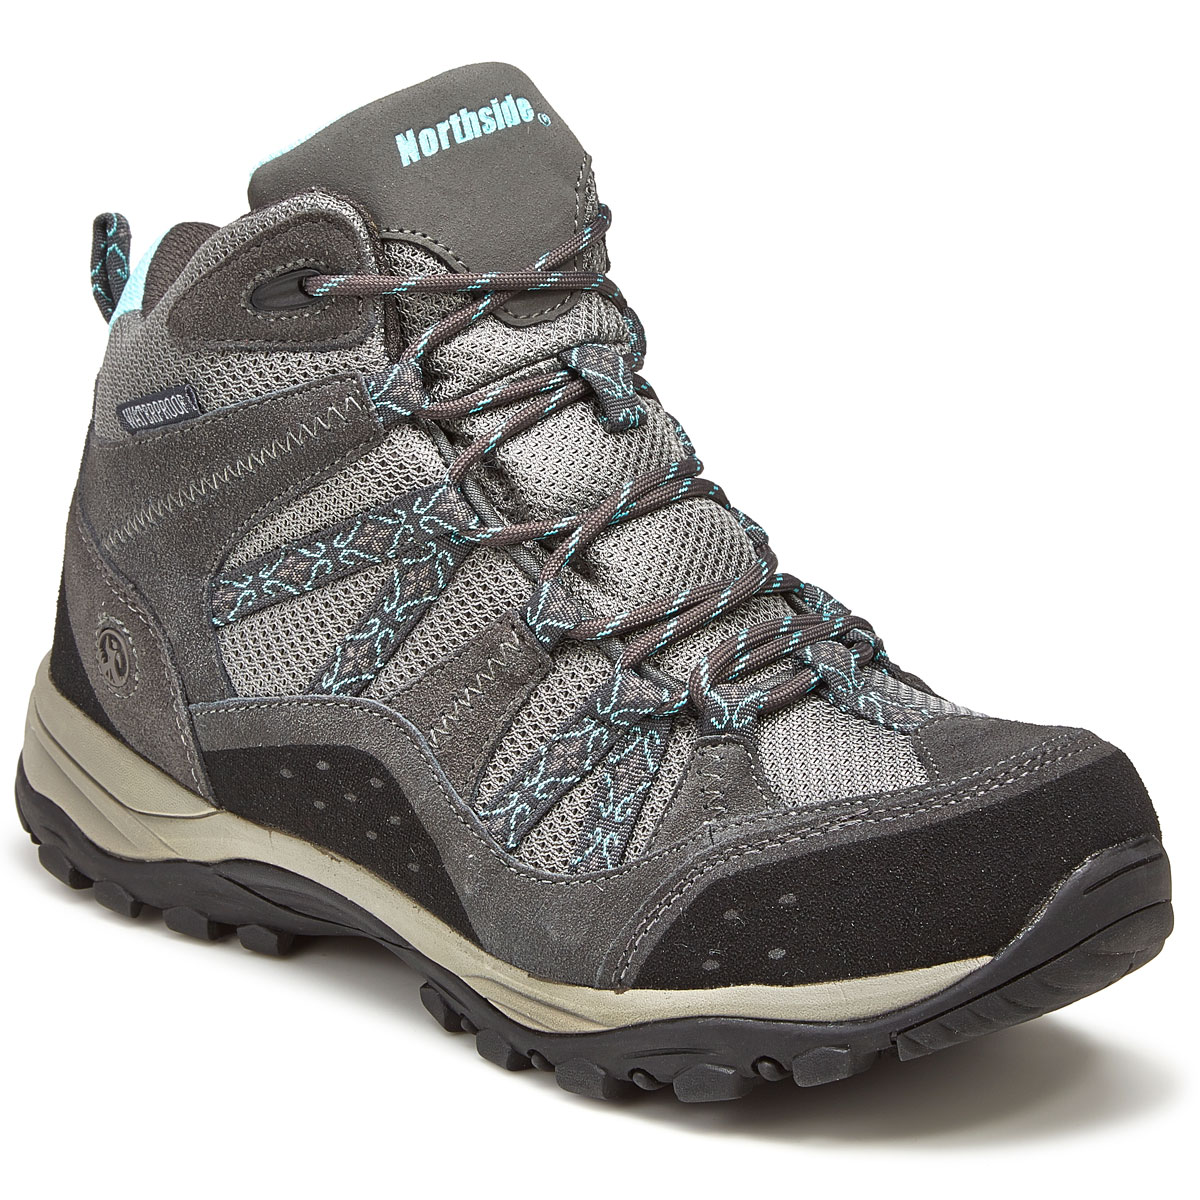 Northside Women's Freemont Mid Waterproof Hiking Boots - Black, 9